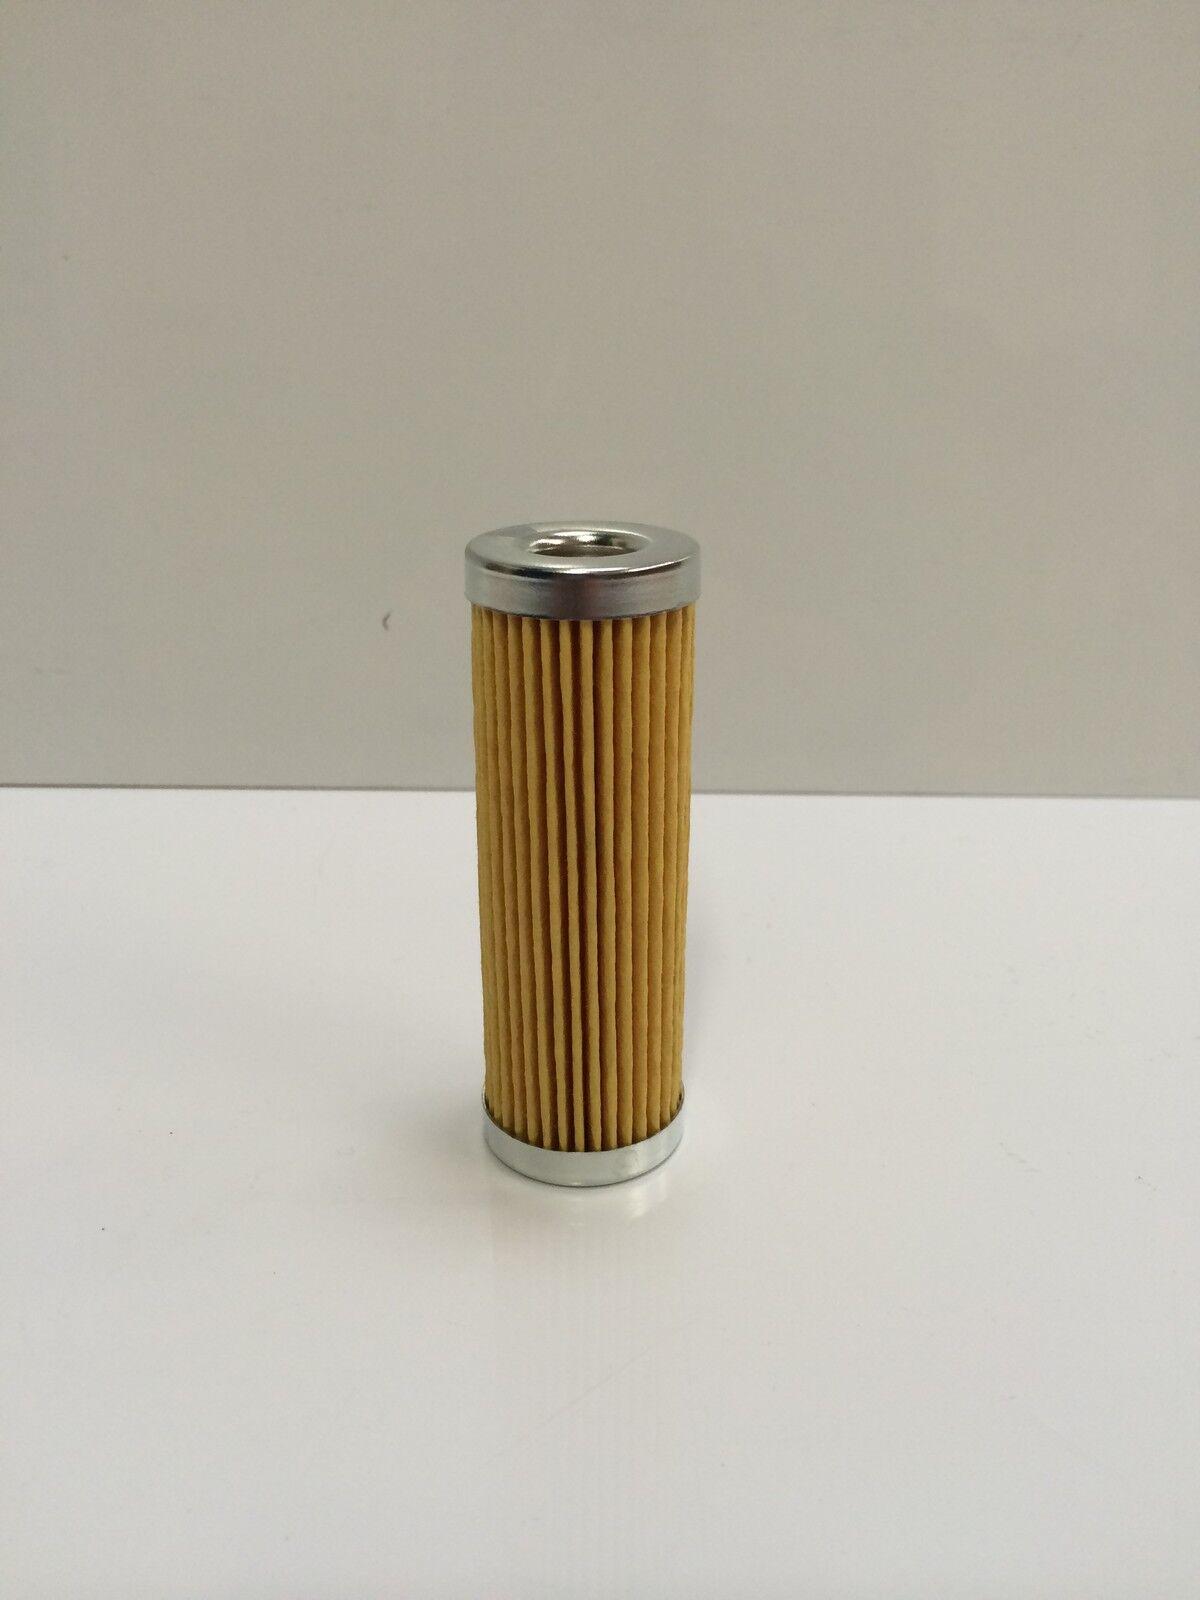 details about fuel filter replace, kubota 15231 43160, 15231 43560, 15231 43561 fuel element Kubota Diesel Fuel Filter